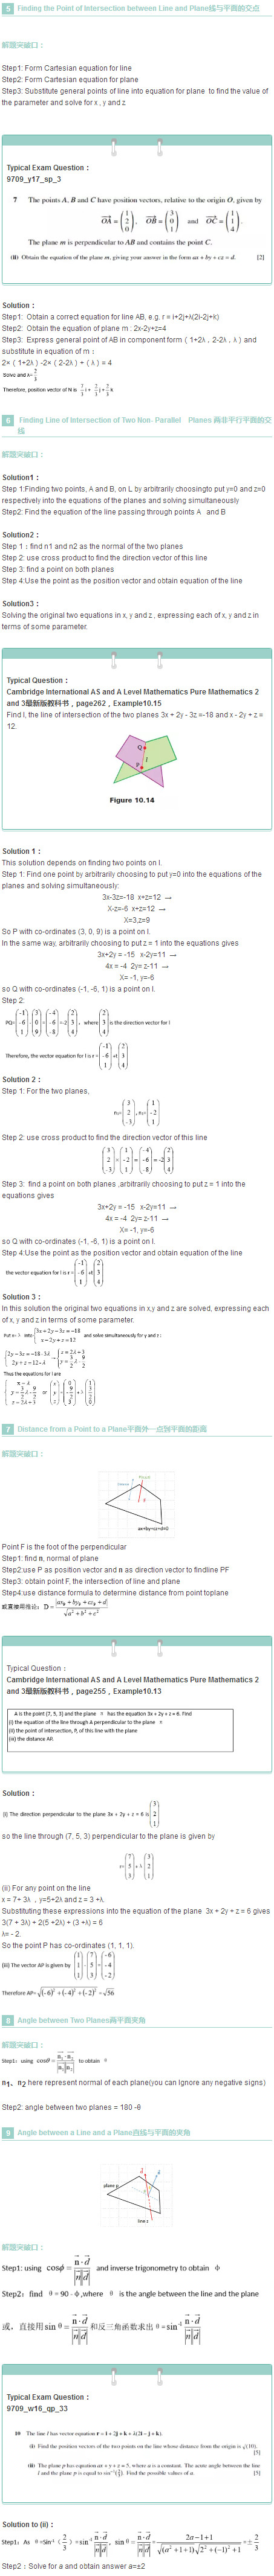 CIE数学 - VECTORS 中的平面问题